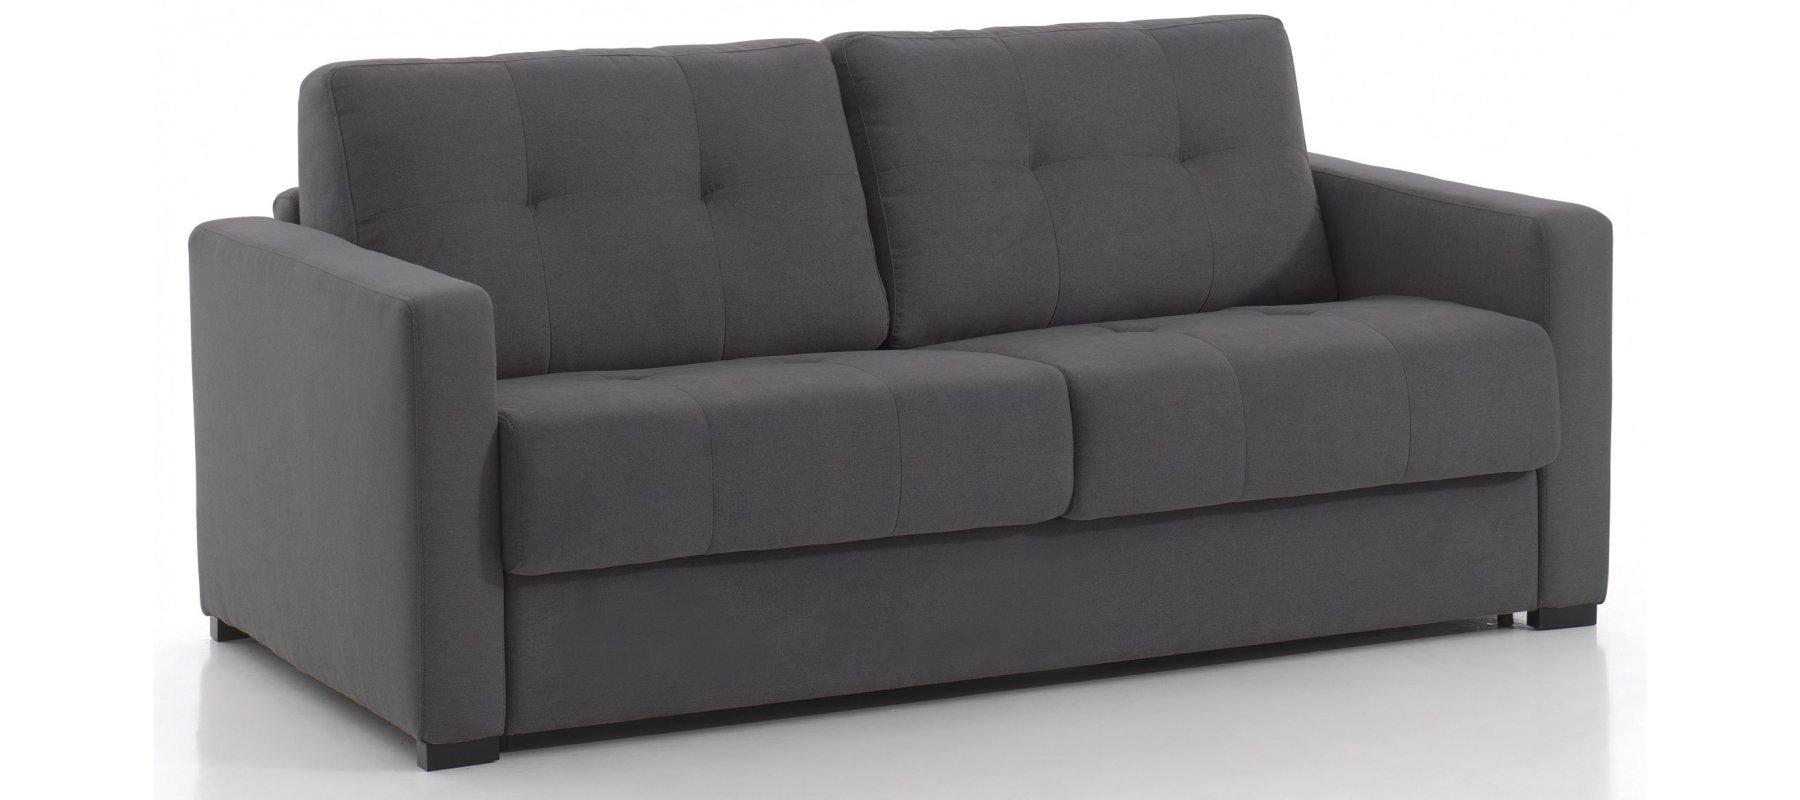 canap convertible 2 places baron 1069 avec couchage 120 cm rapido. Black Bedroom Furniture Sets. Home Design Ideas